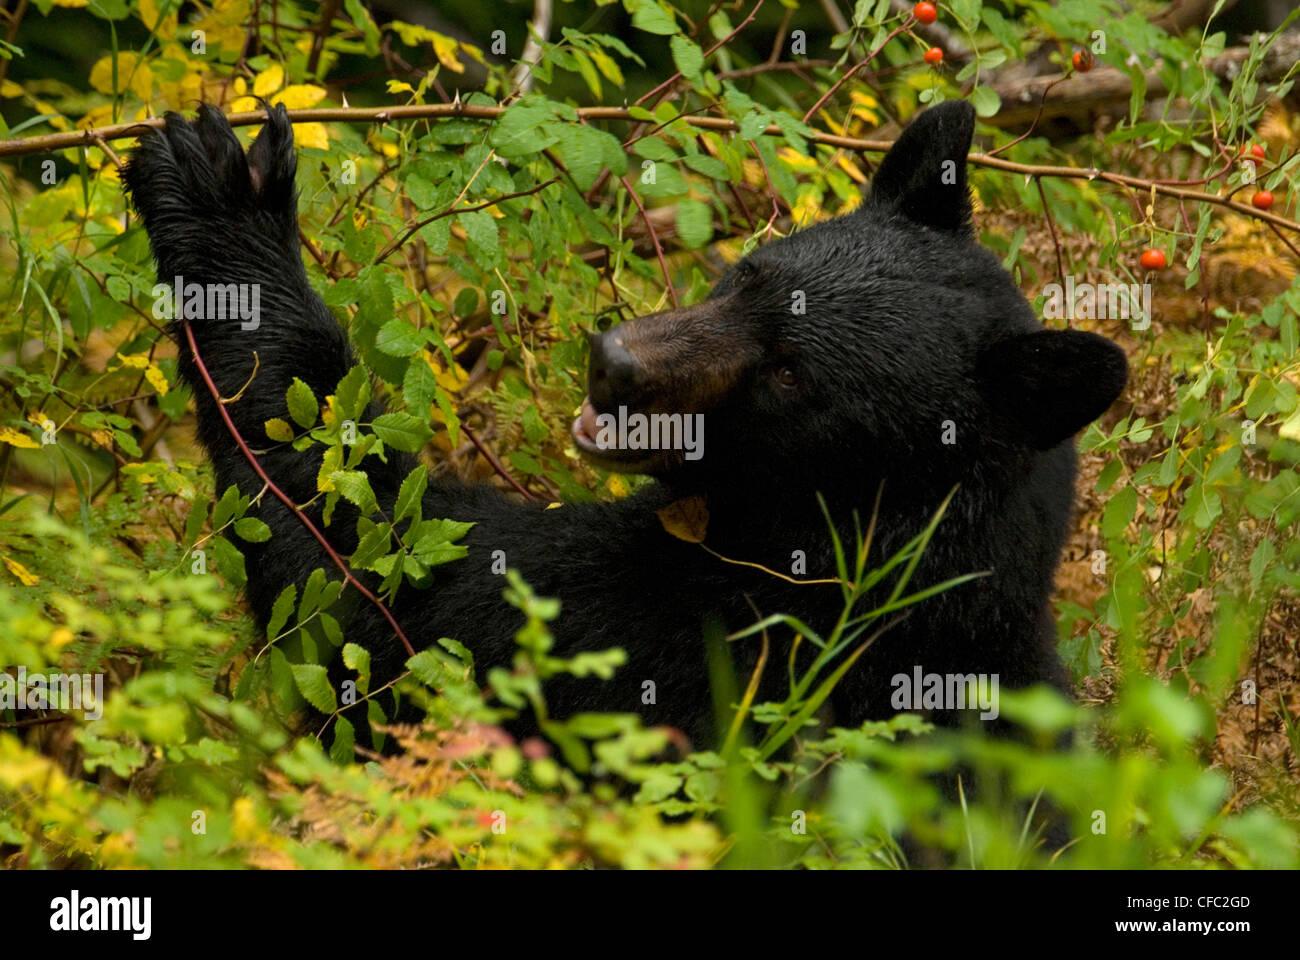 Un oso negro rosehips come en un día lluvioso en Bella Coola, British Columbia, Canadá Imagen De Stock